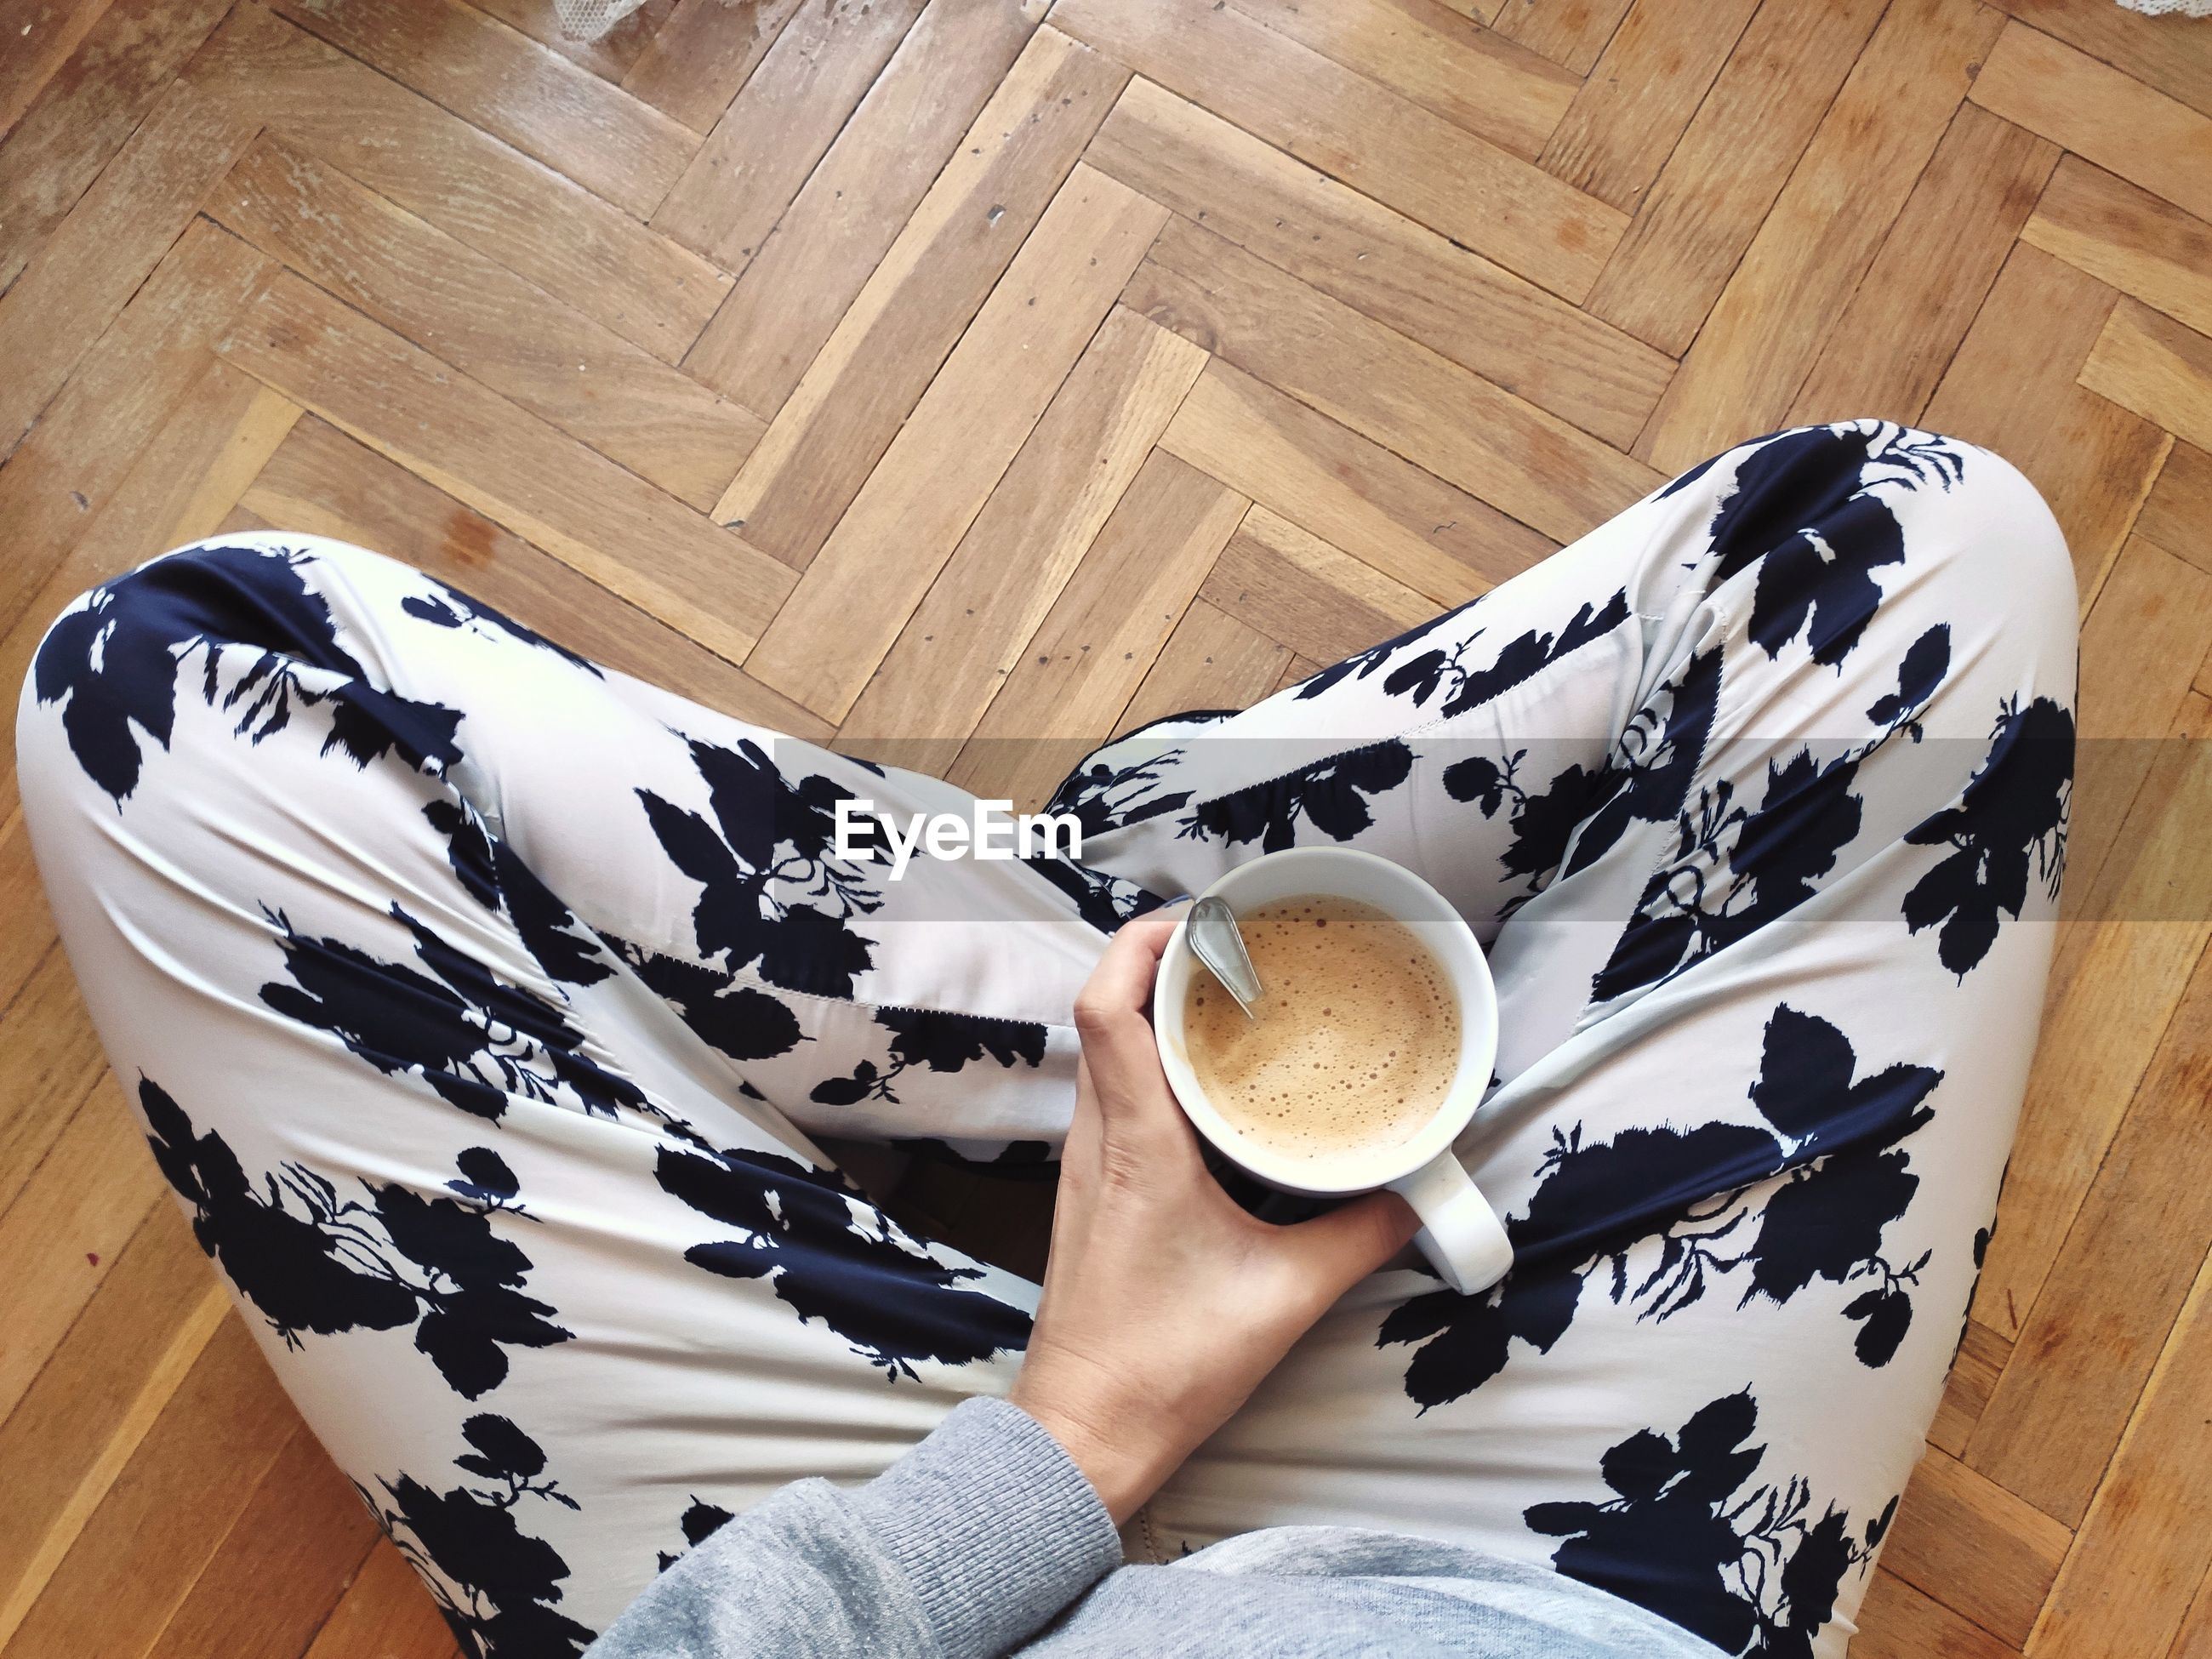 HIGH ANGLE VIEW OF COFFEE CUP ON HARDWOOD FLOOR